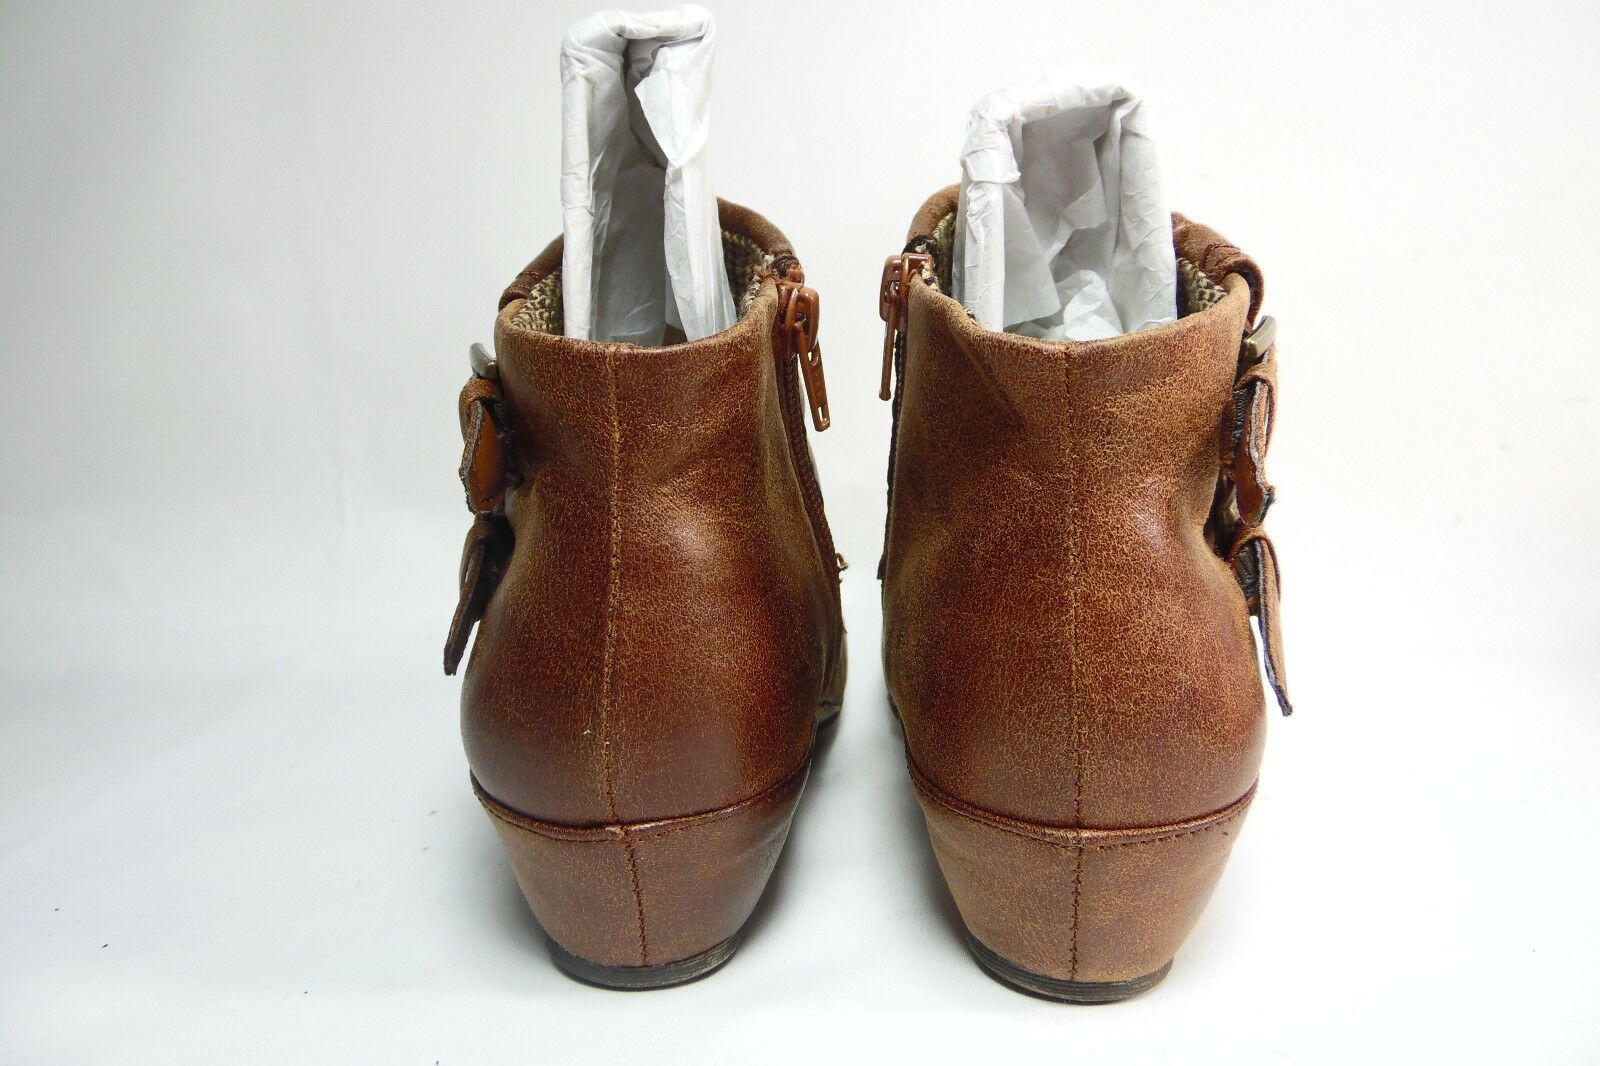 Yuu Sindi Damens  Ankle Booties  Auburn.Größe 5.5M